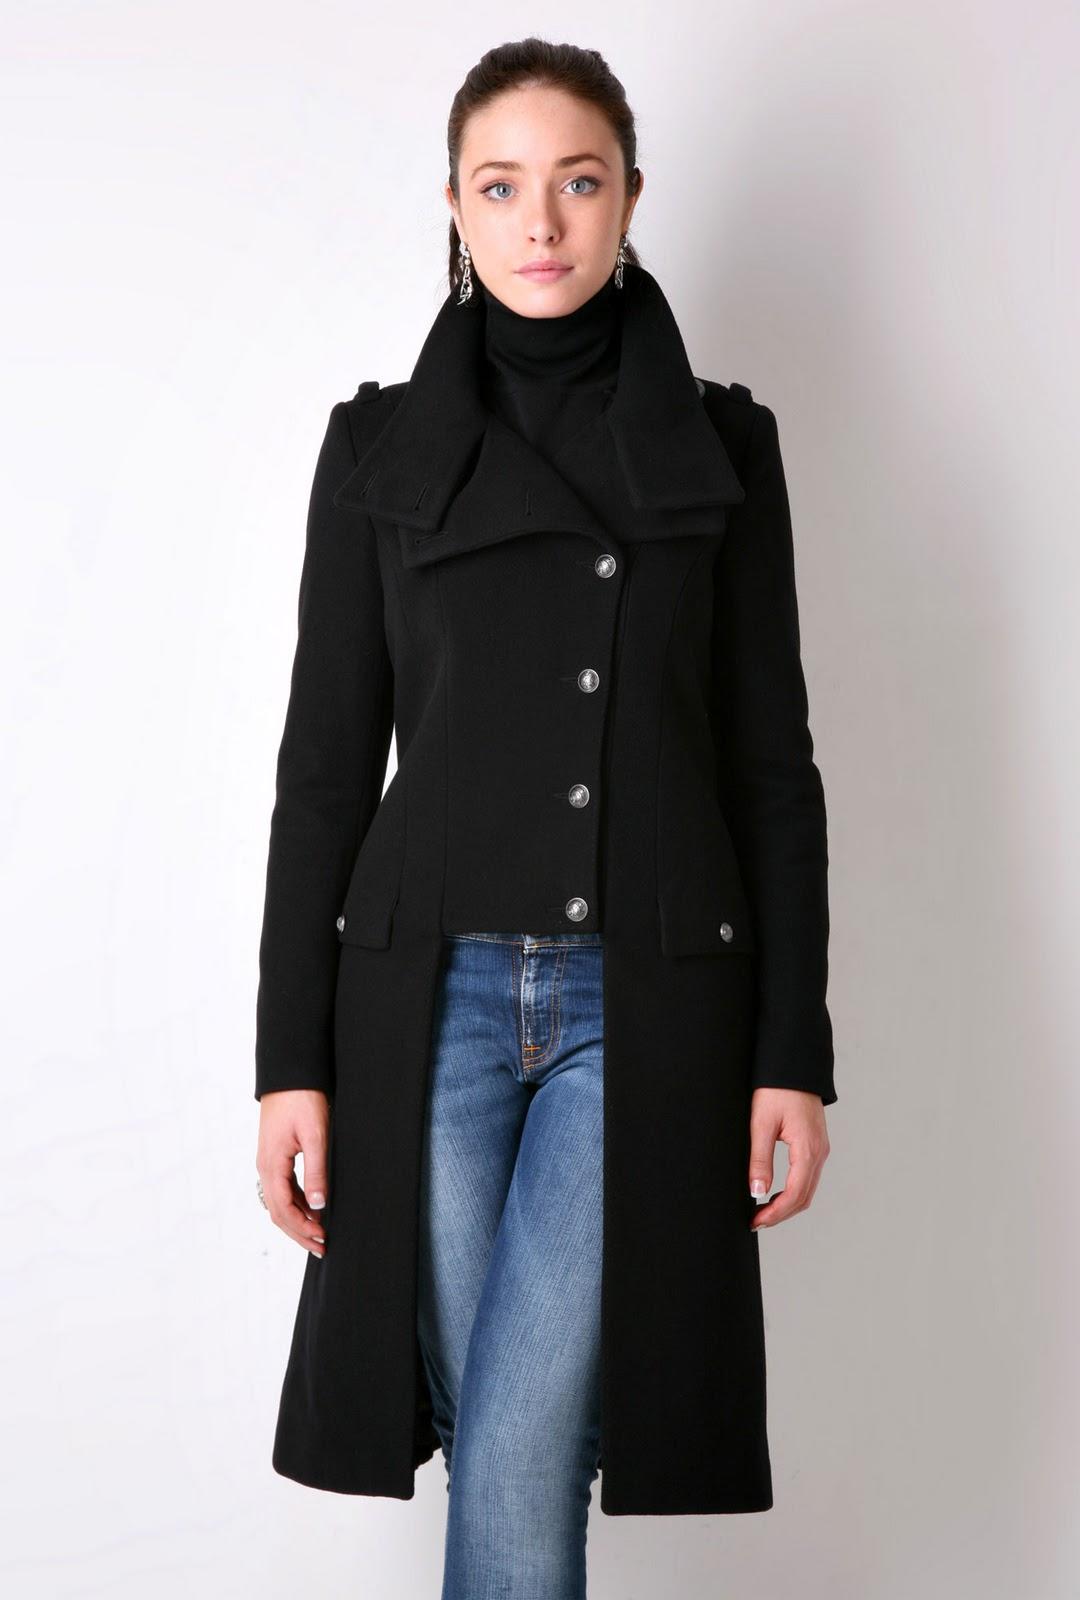 Coat styles women